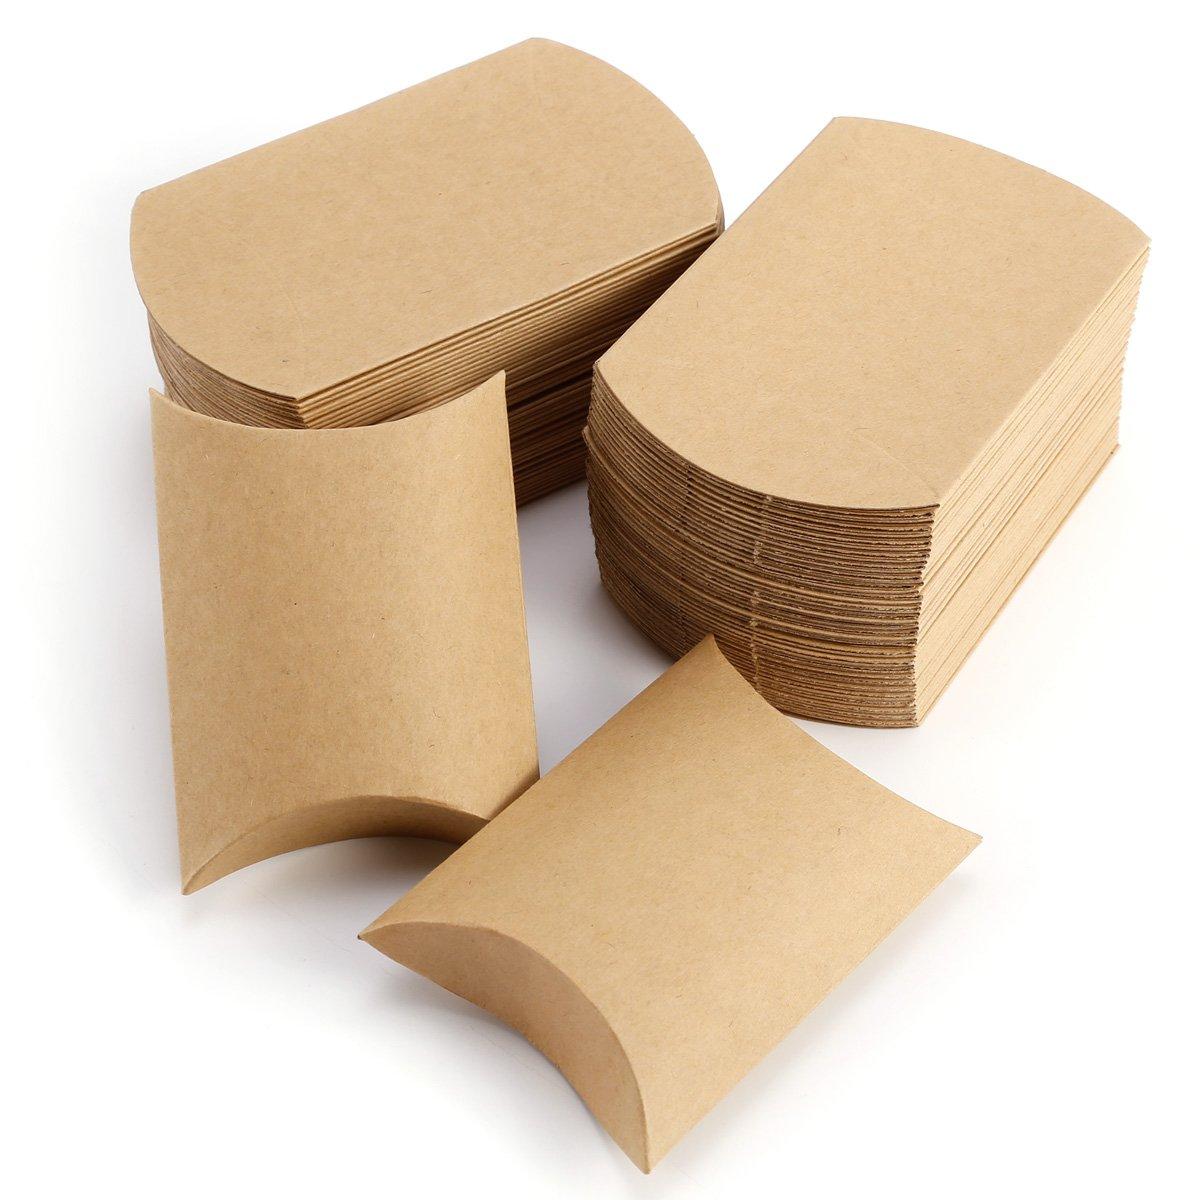 Pillow Shape 50PCS 100PCS 100 Eco Kraft Card carry Boxes Gift or Wedding Favour Boxes